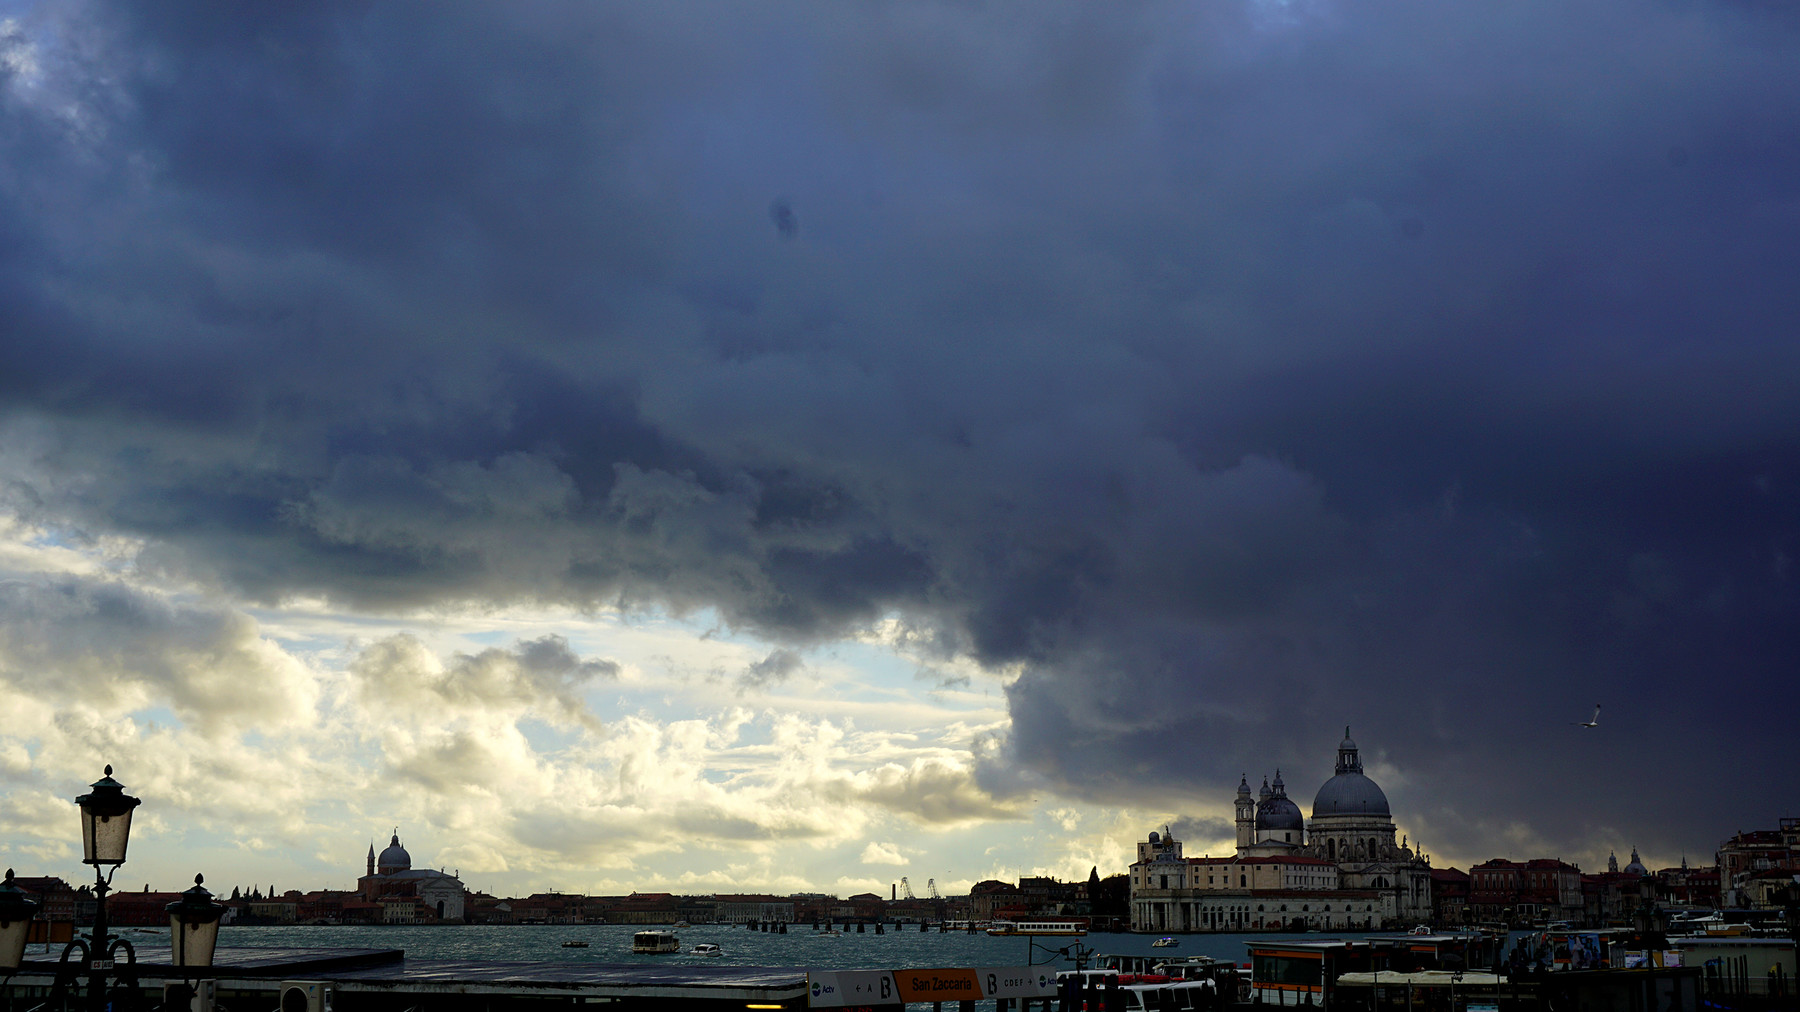 Venice%20photo%20%2843%29